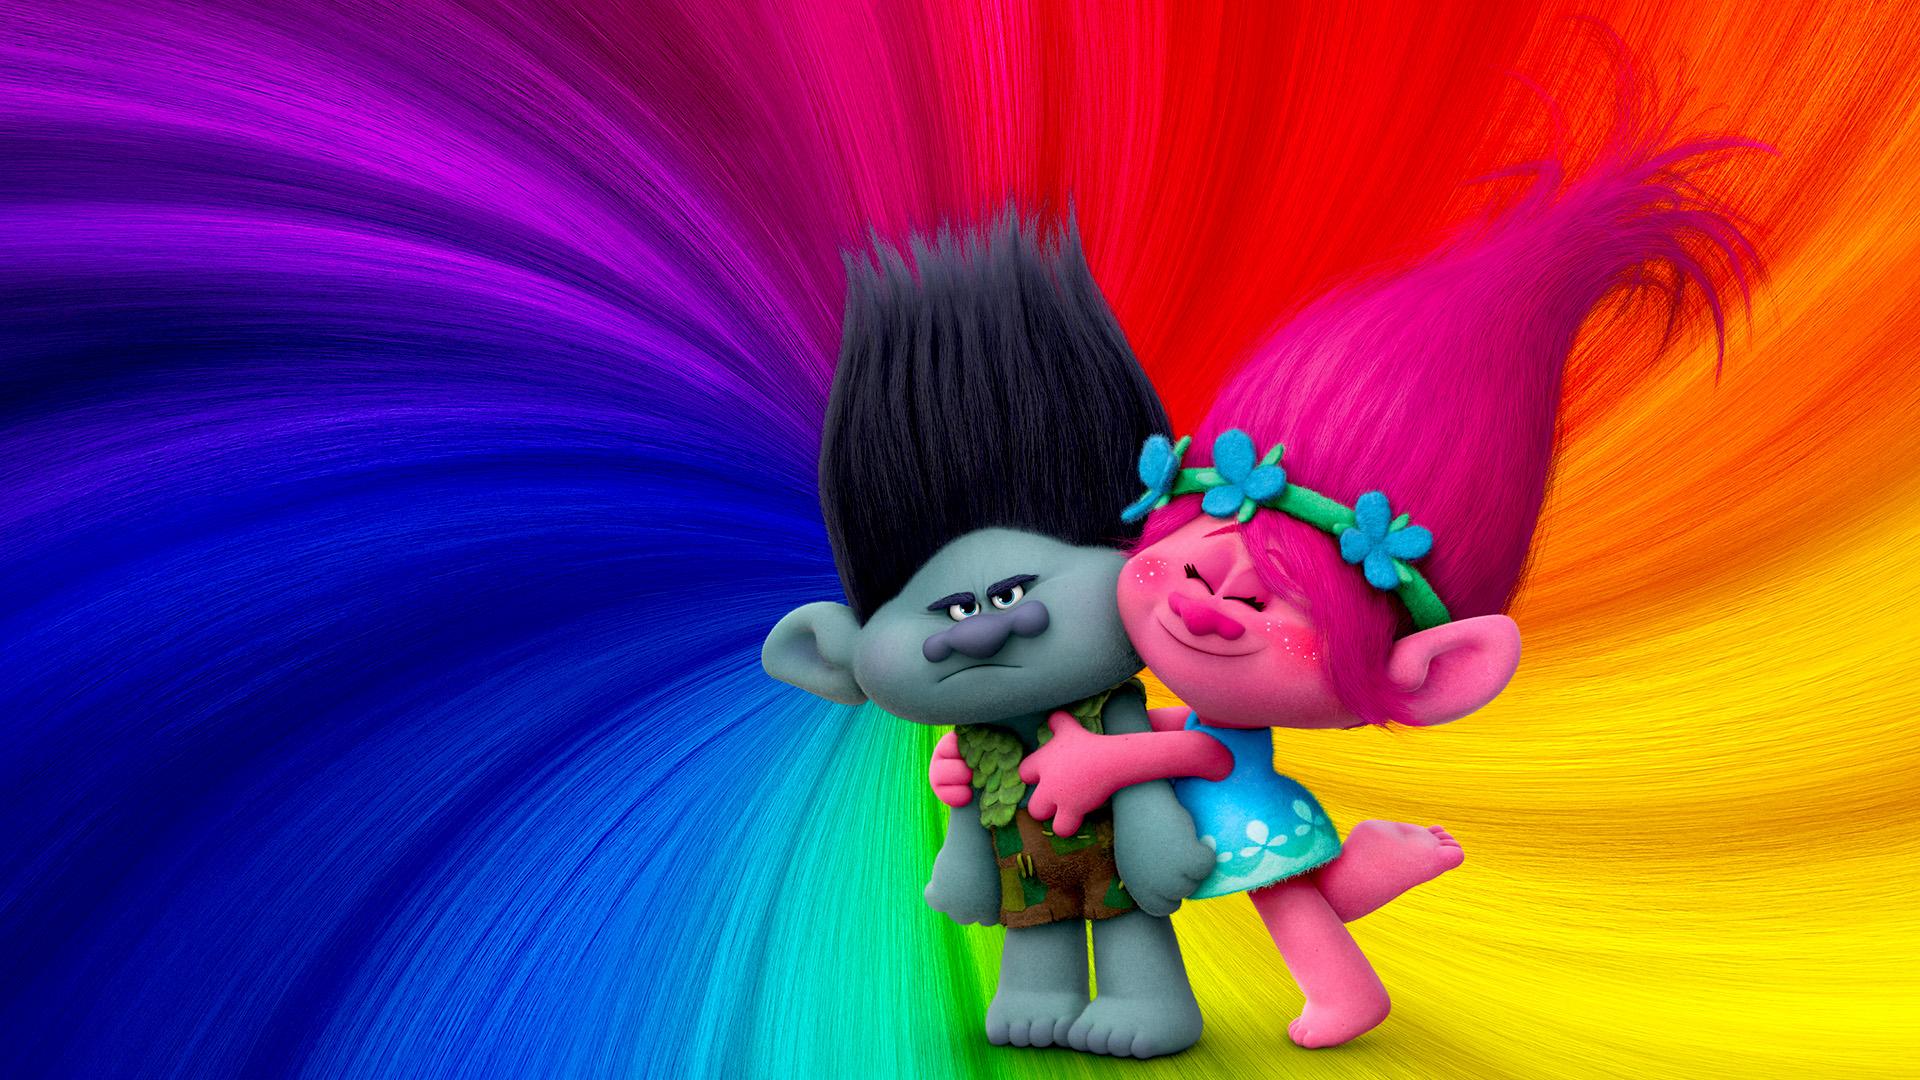 Wallpaper Trolls animation movie, 2016 movie, colorful